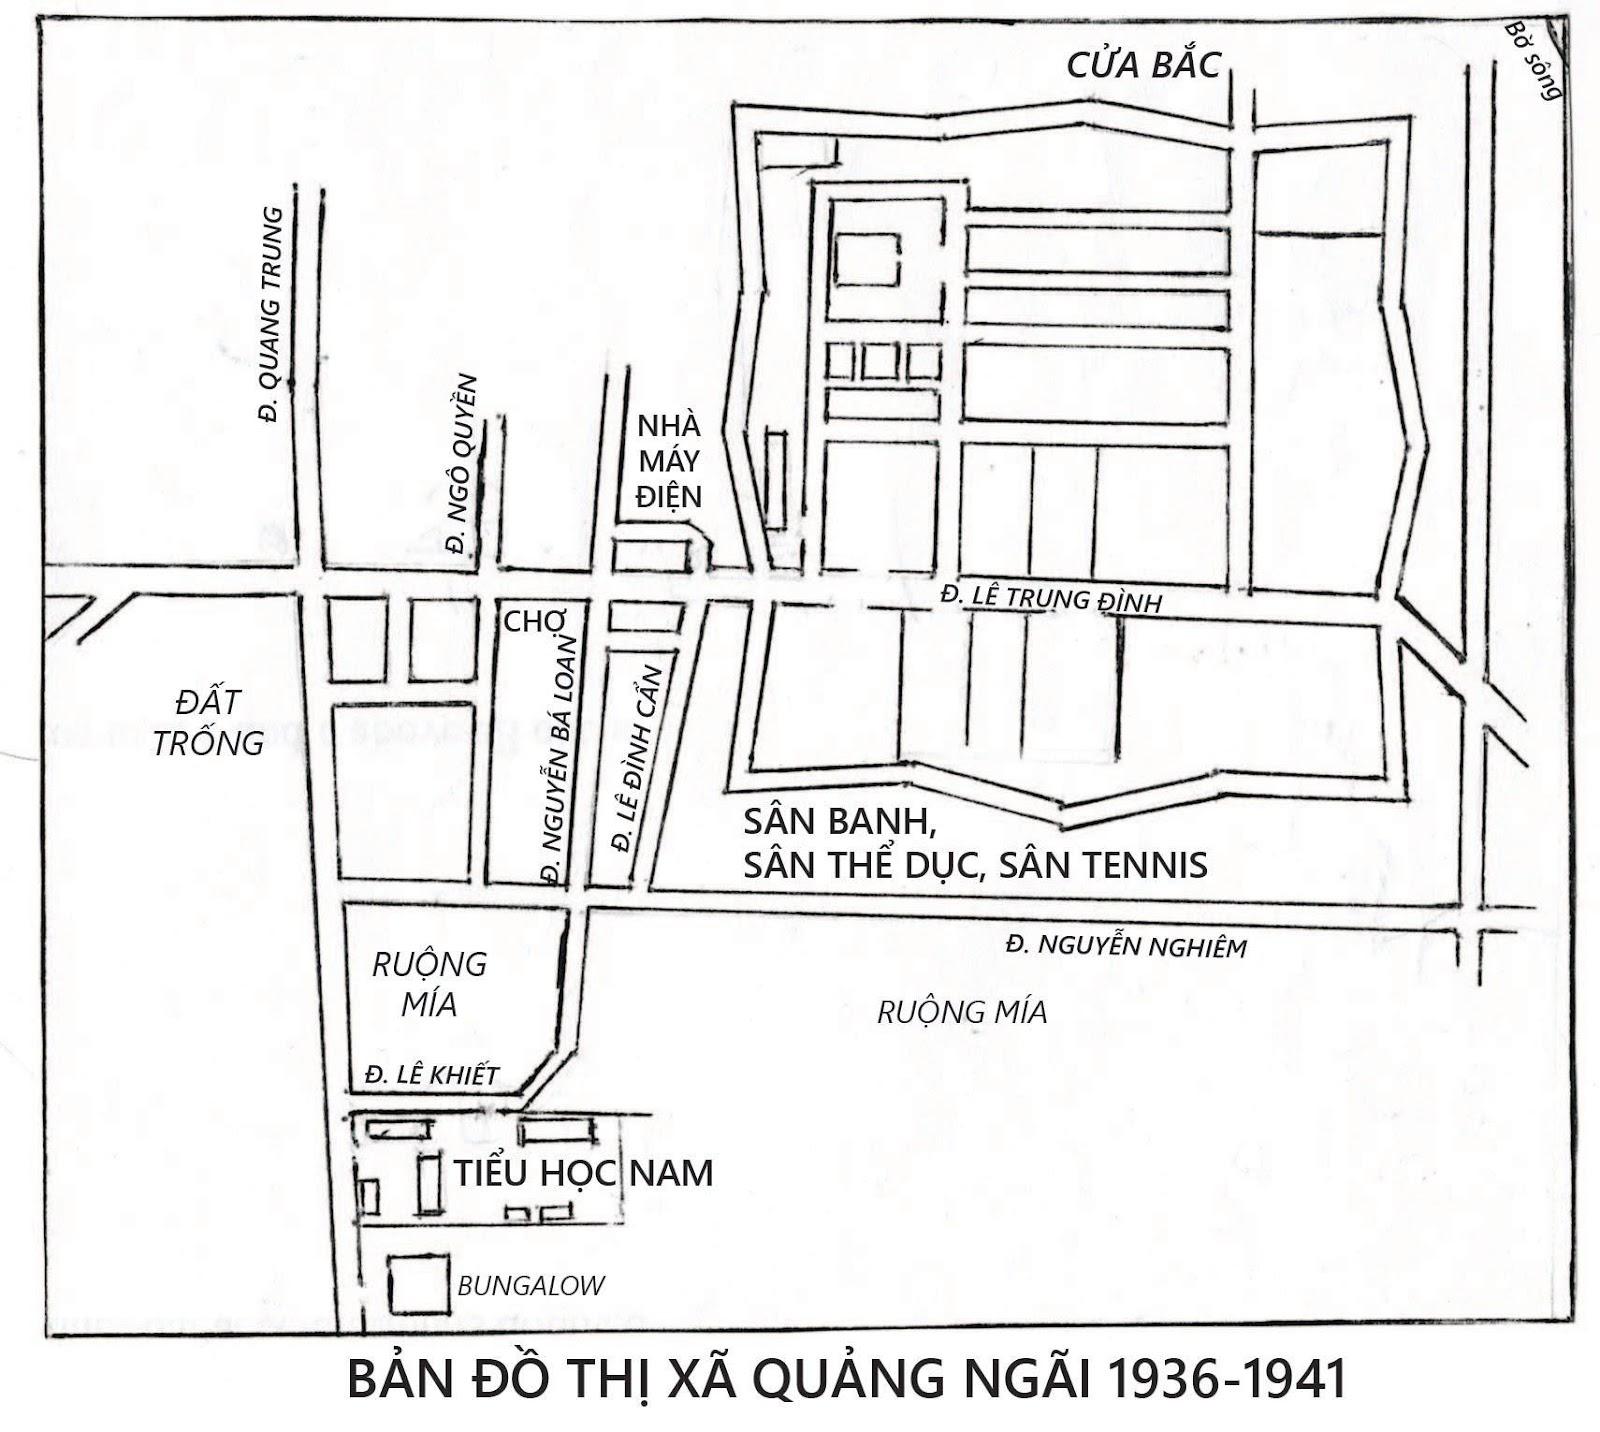 ThiXa_QuangNgai_1936-1941.jpg